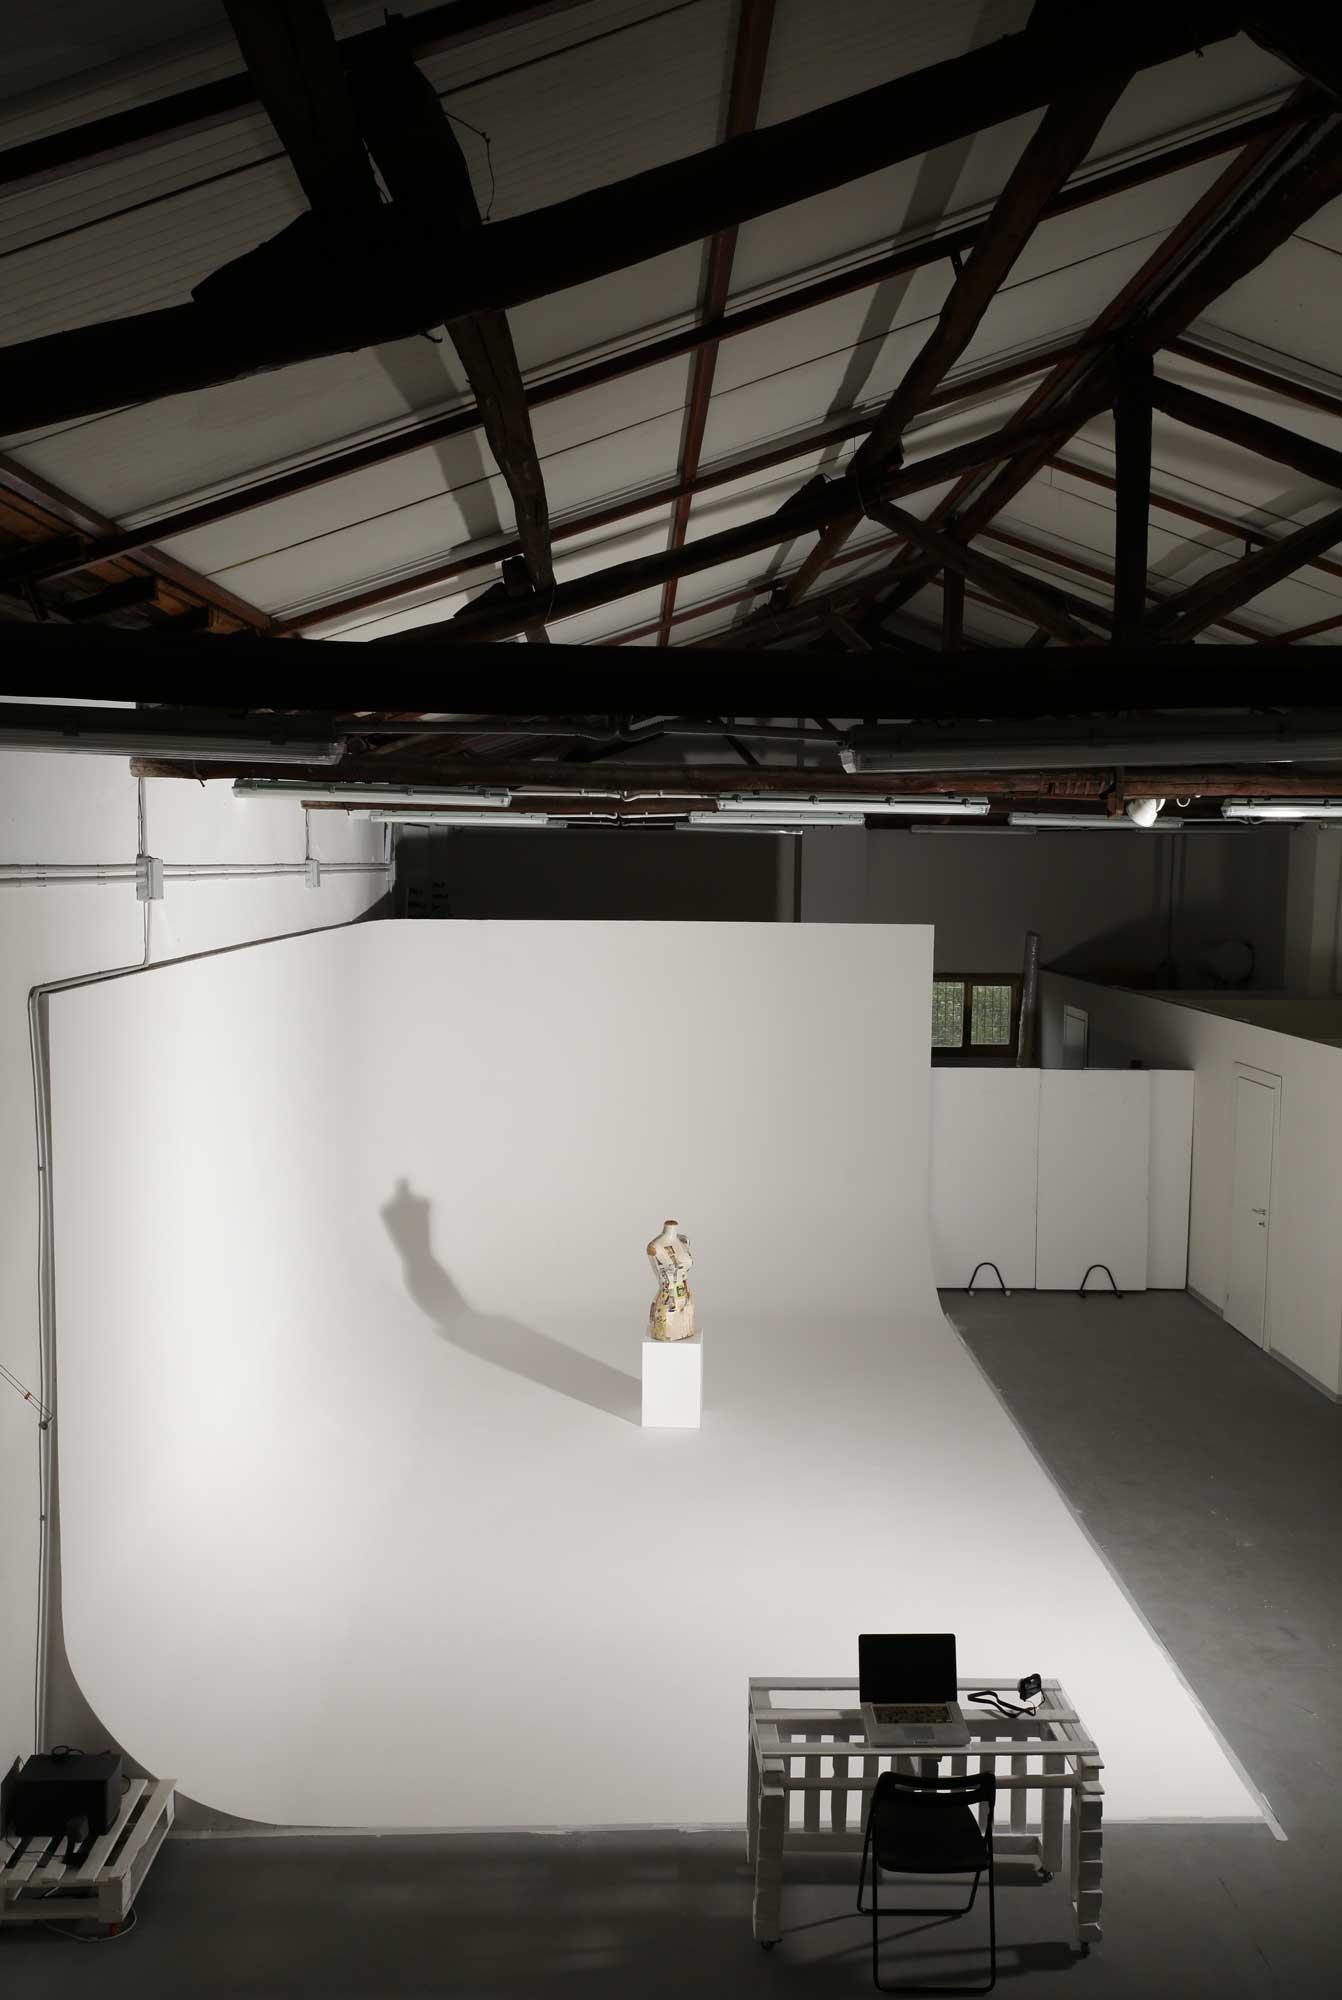 noleggio limbo cyclorama roma sala posa studio fotografico9